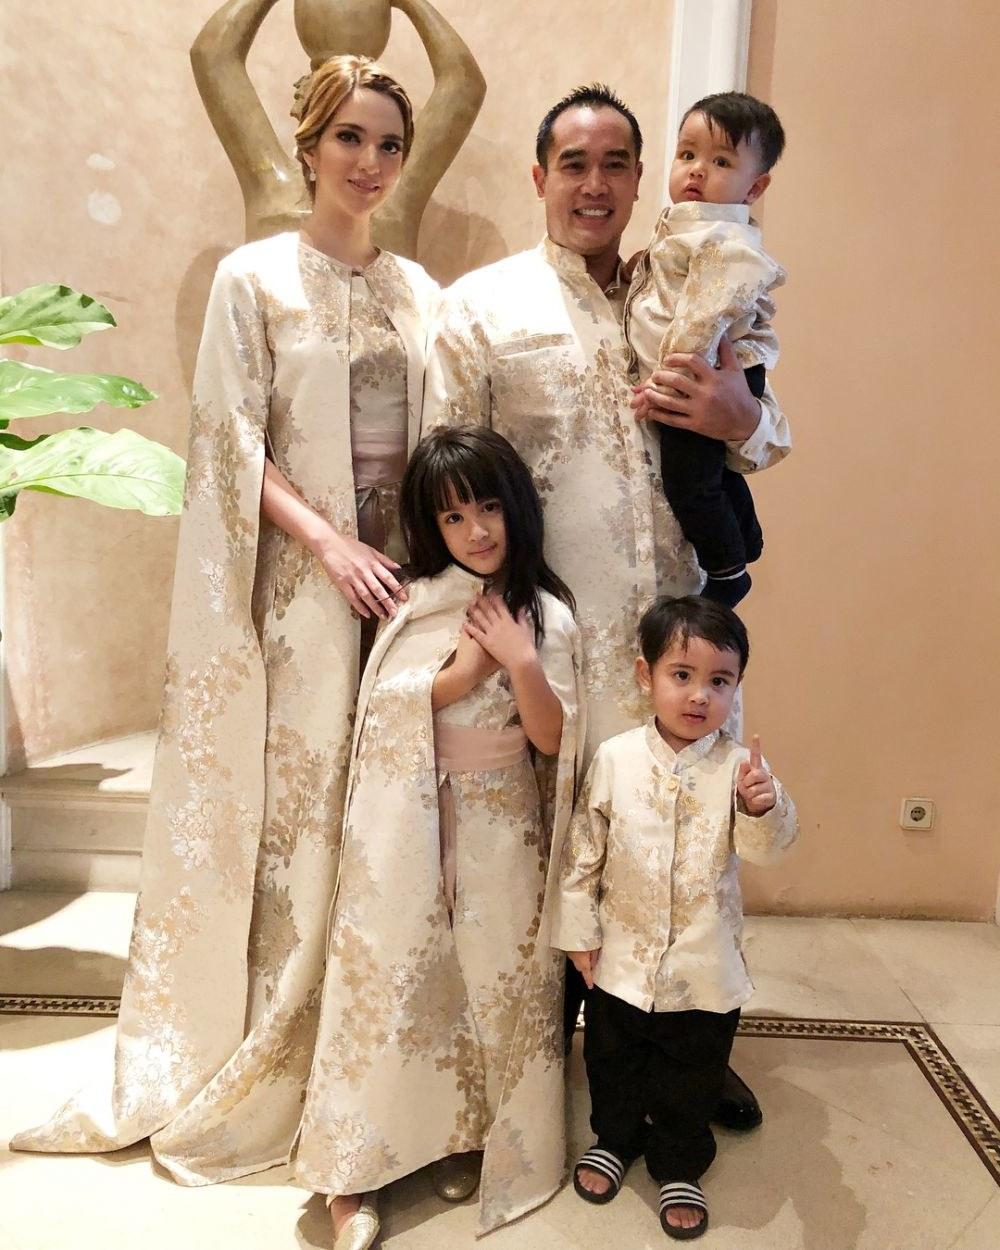 Design Baju Lebaran Putih Keluarga S5d8 Potret 16 Seleb Pakai Baju Kembaran Saat Lebaran Kompak Abis